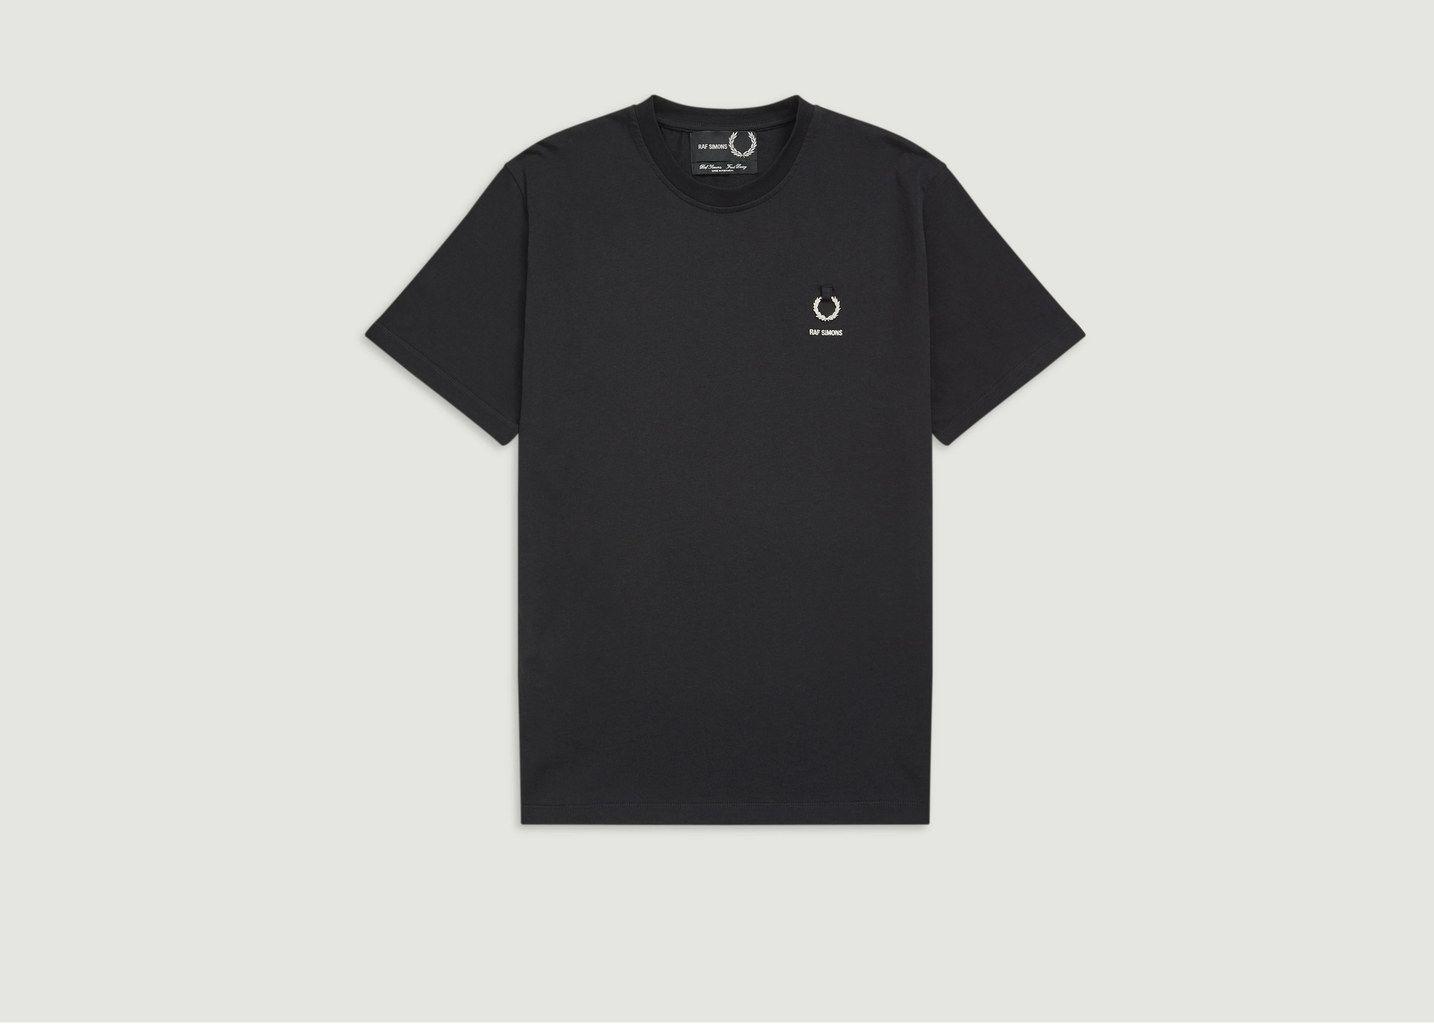 T-shirt Col Ras du Cou - Fred Perry x Raf Simons